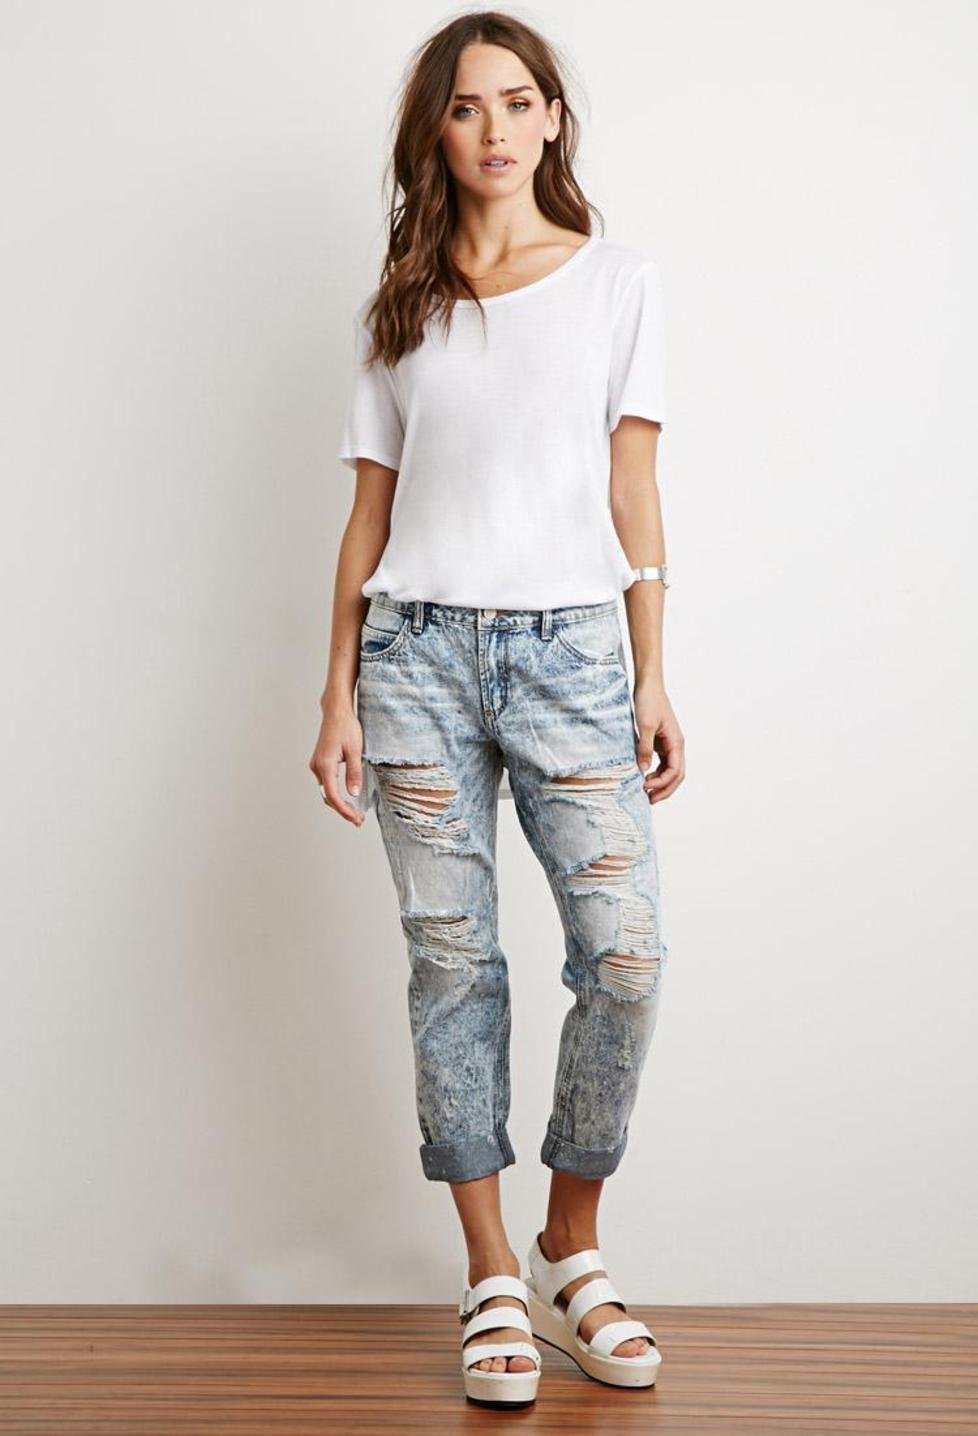 The model in Distressed Acid Wash Boyfriend Jeans.